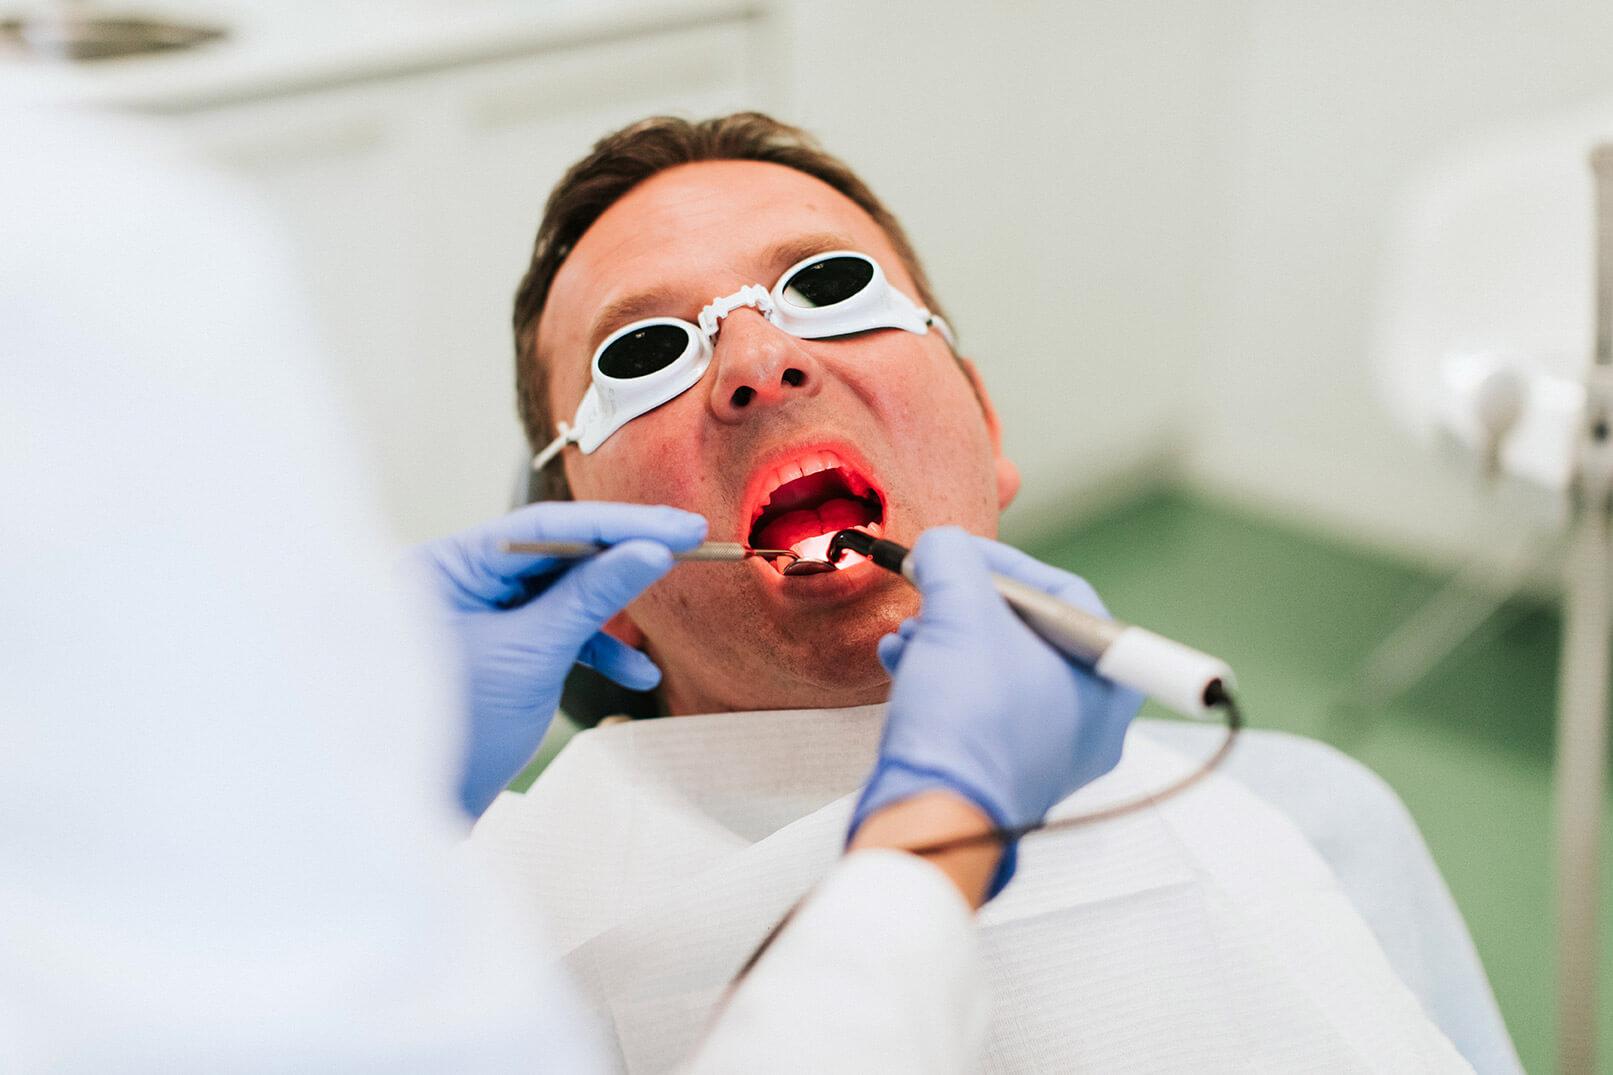 dentalni laser, laserski zahvat, liječenje laserom, sirona, ordinacija sanja vuić, zagreb